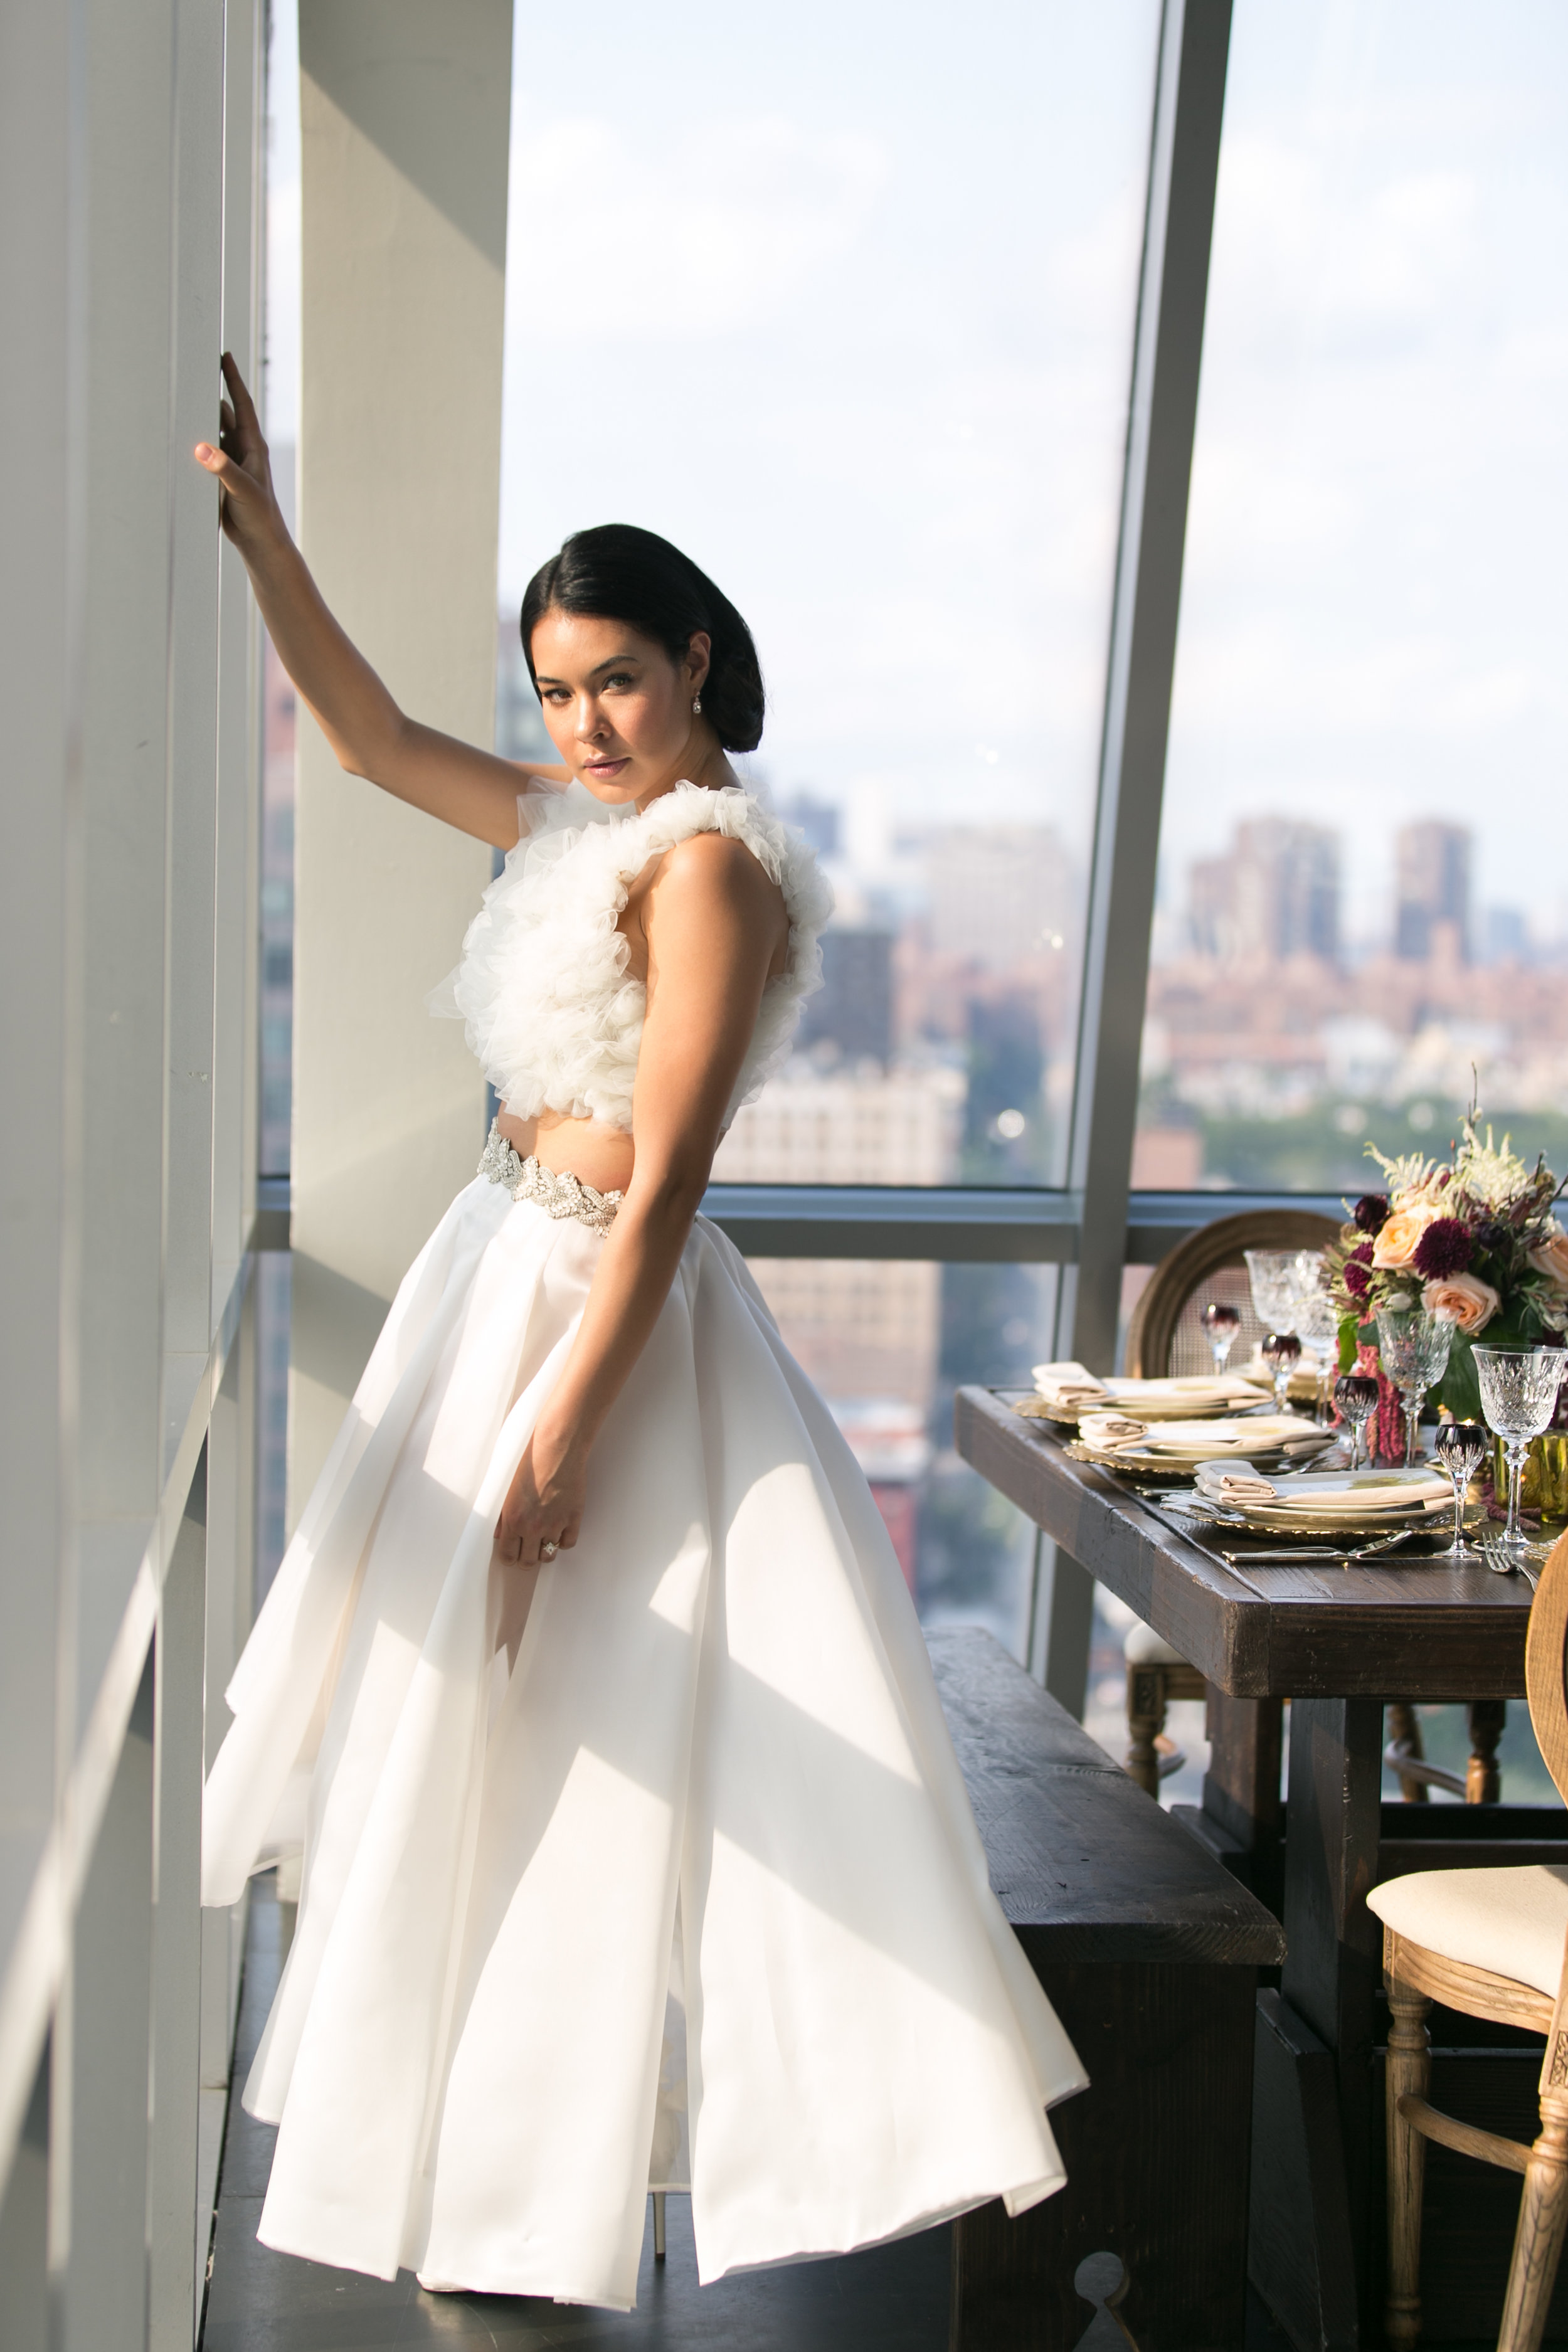 Nathalie Kraynina BrideBond_Girl_Bride_GinaEsposito-64.jpg